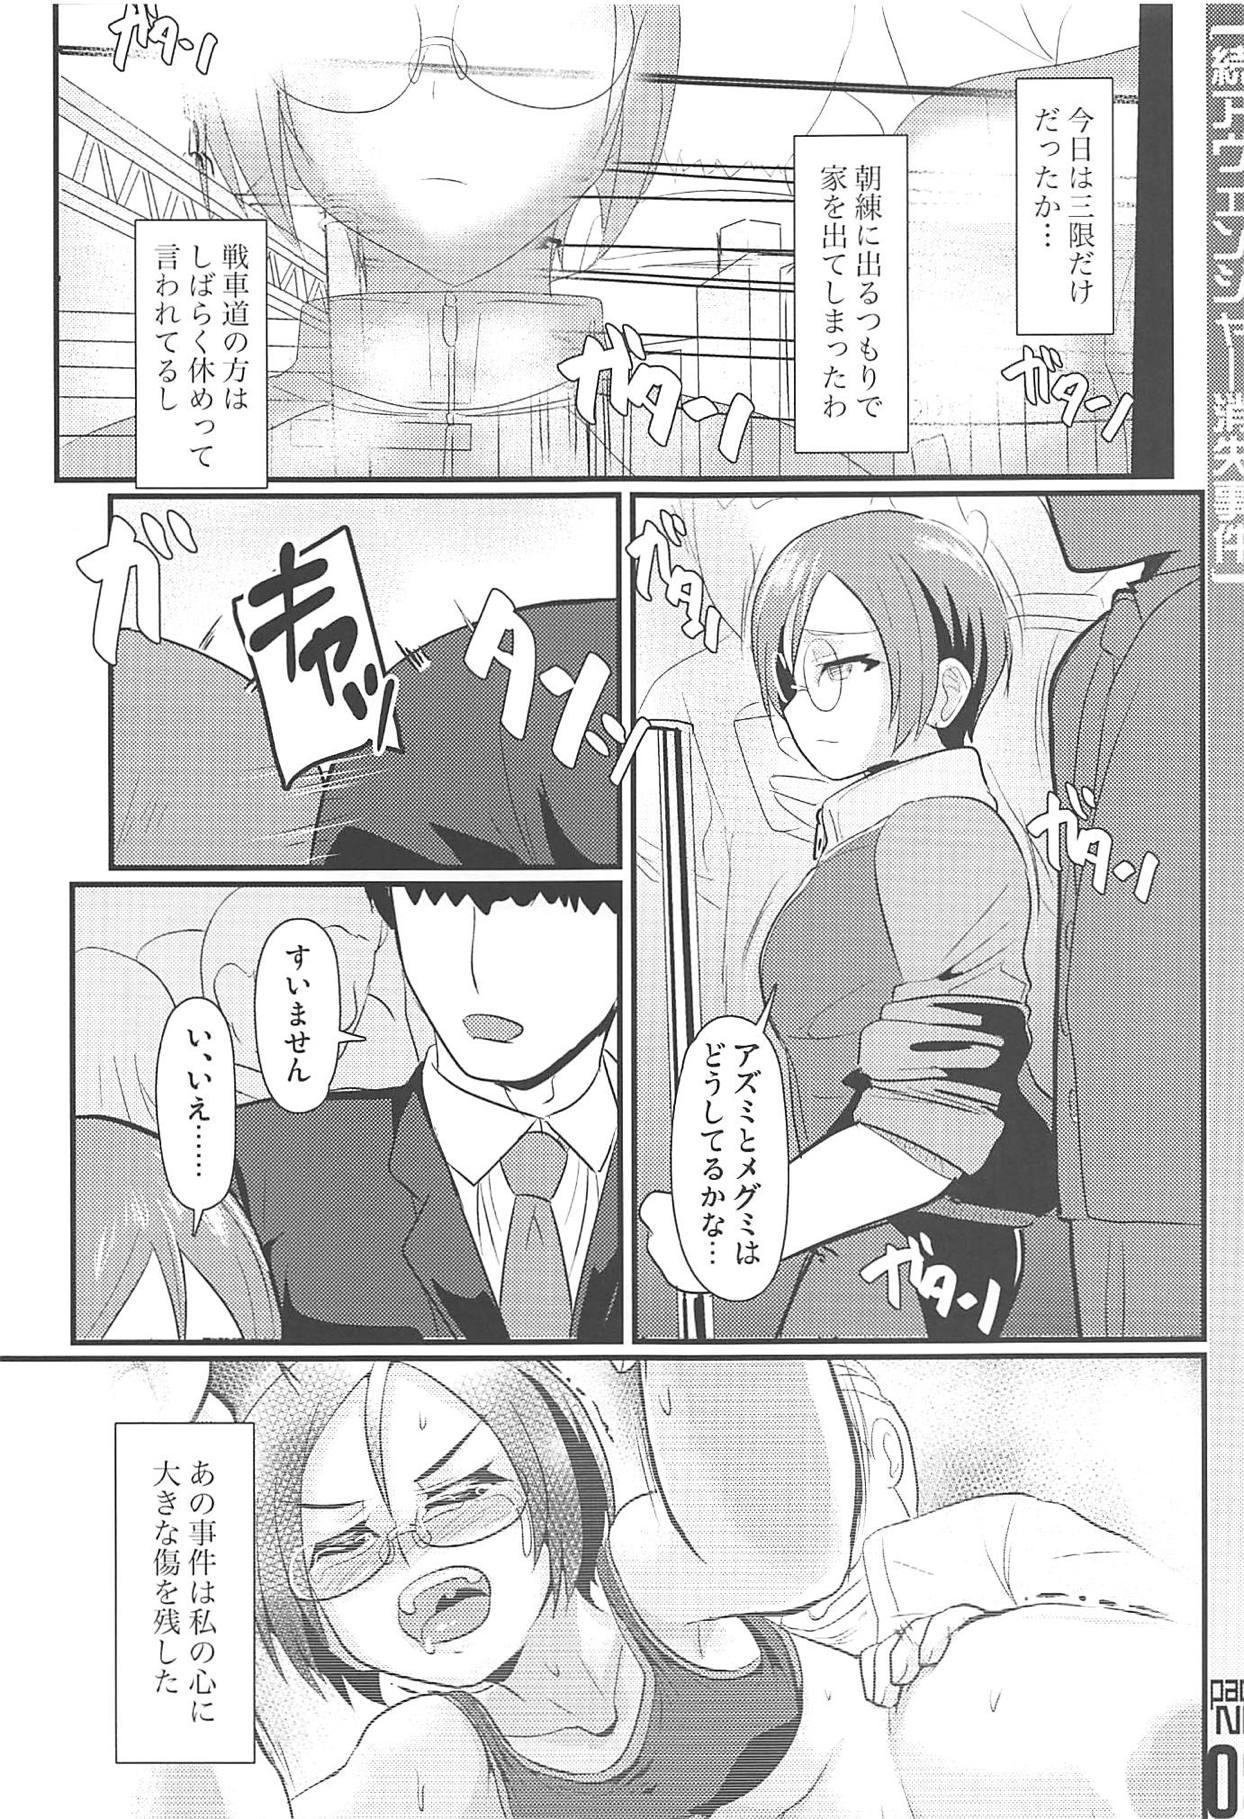 (Panzer Vor! 15) [Trample Rigger (Yequo)] Zoku [Ru-gata] Avenger Shoushitsu Jiken (Girls und Panzer) 7